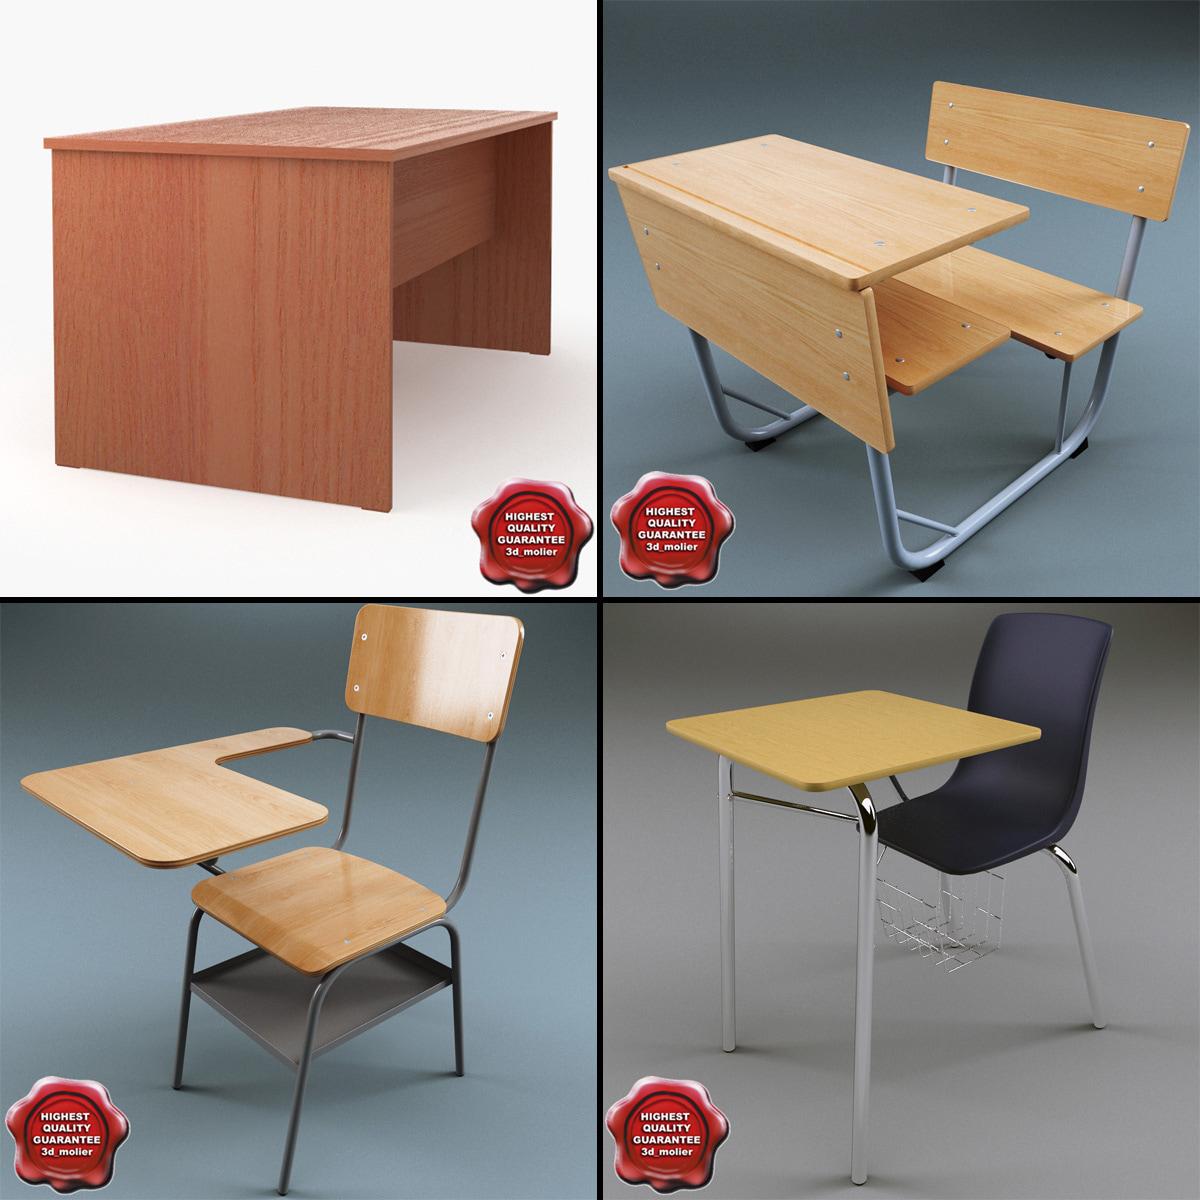 School_Desks_Collection_000.jpg